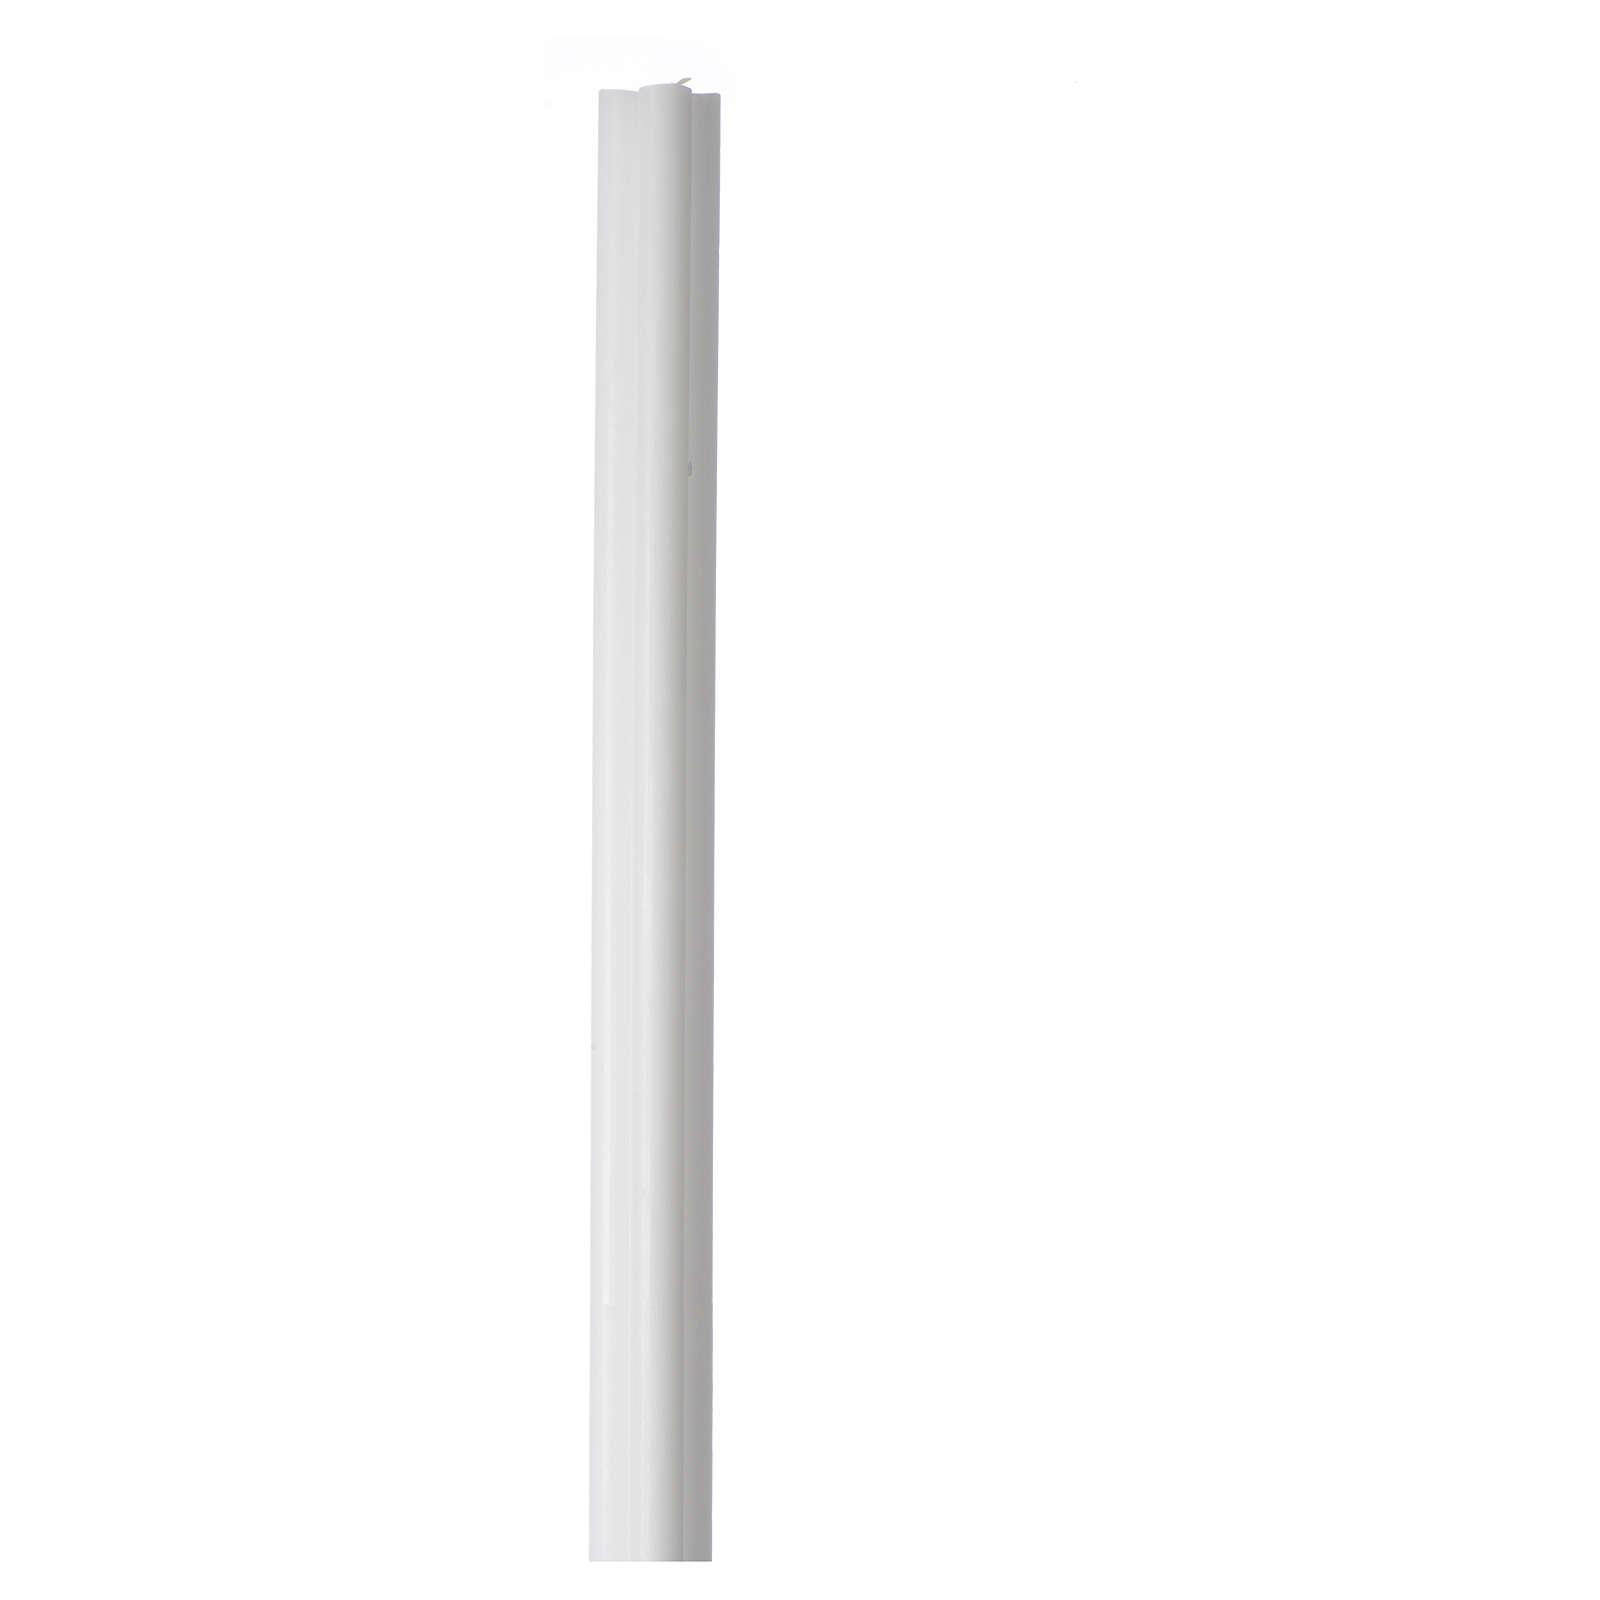 Círio Antiga Tocha 800x50x50 mm cera branca (caixa) 3